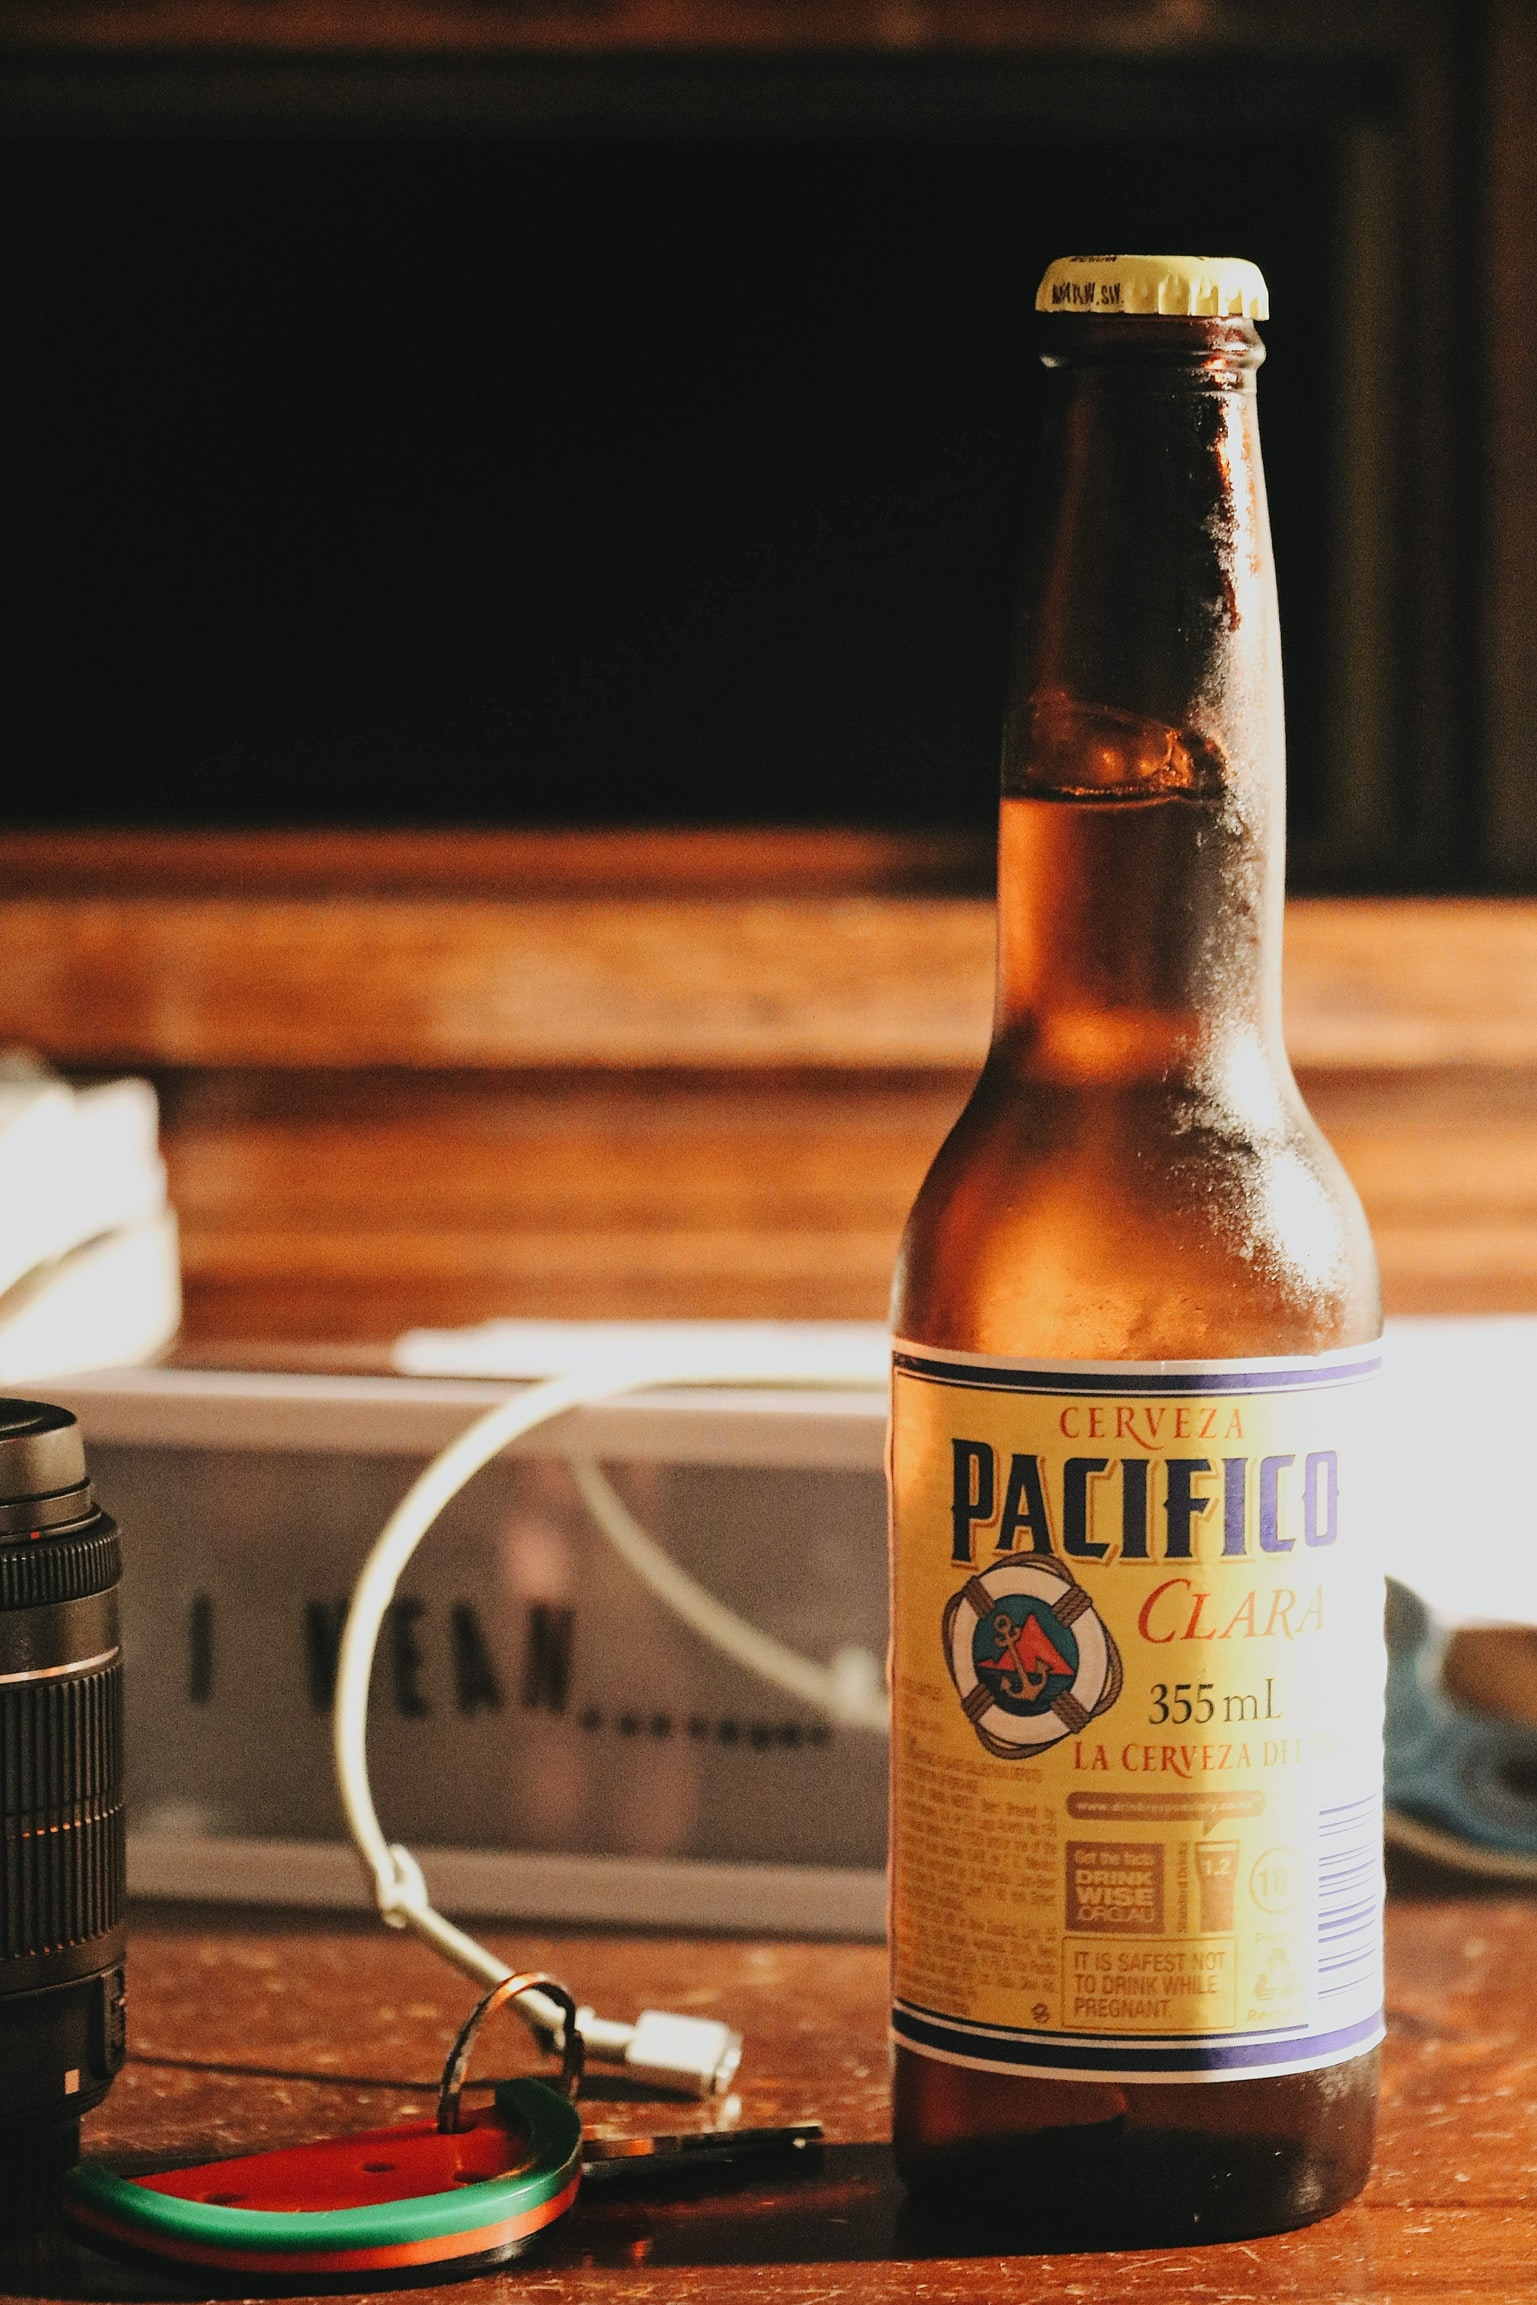 Cerveza Pacifico beer bottle